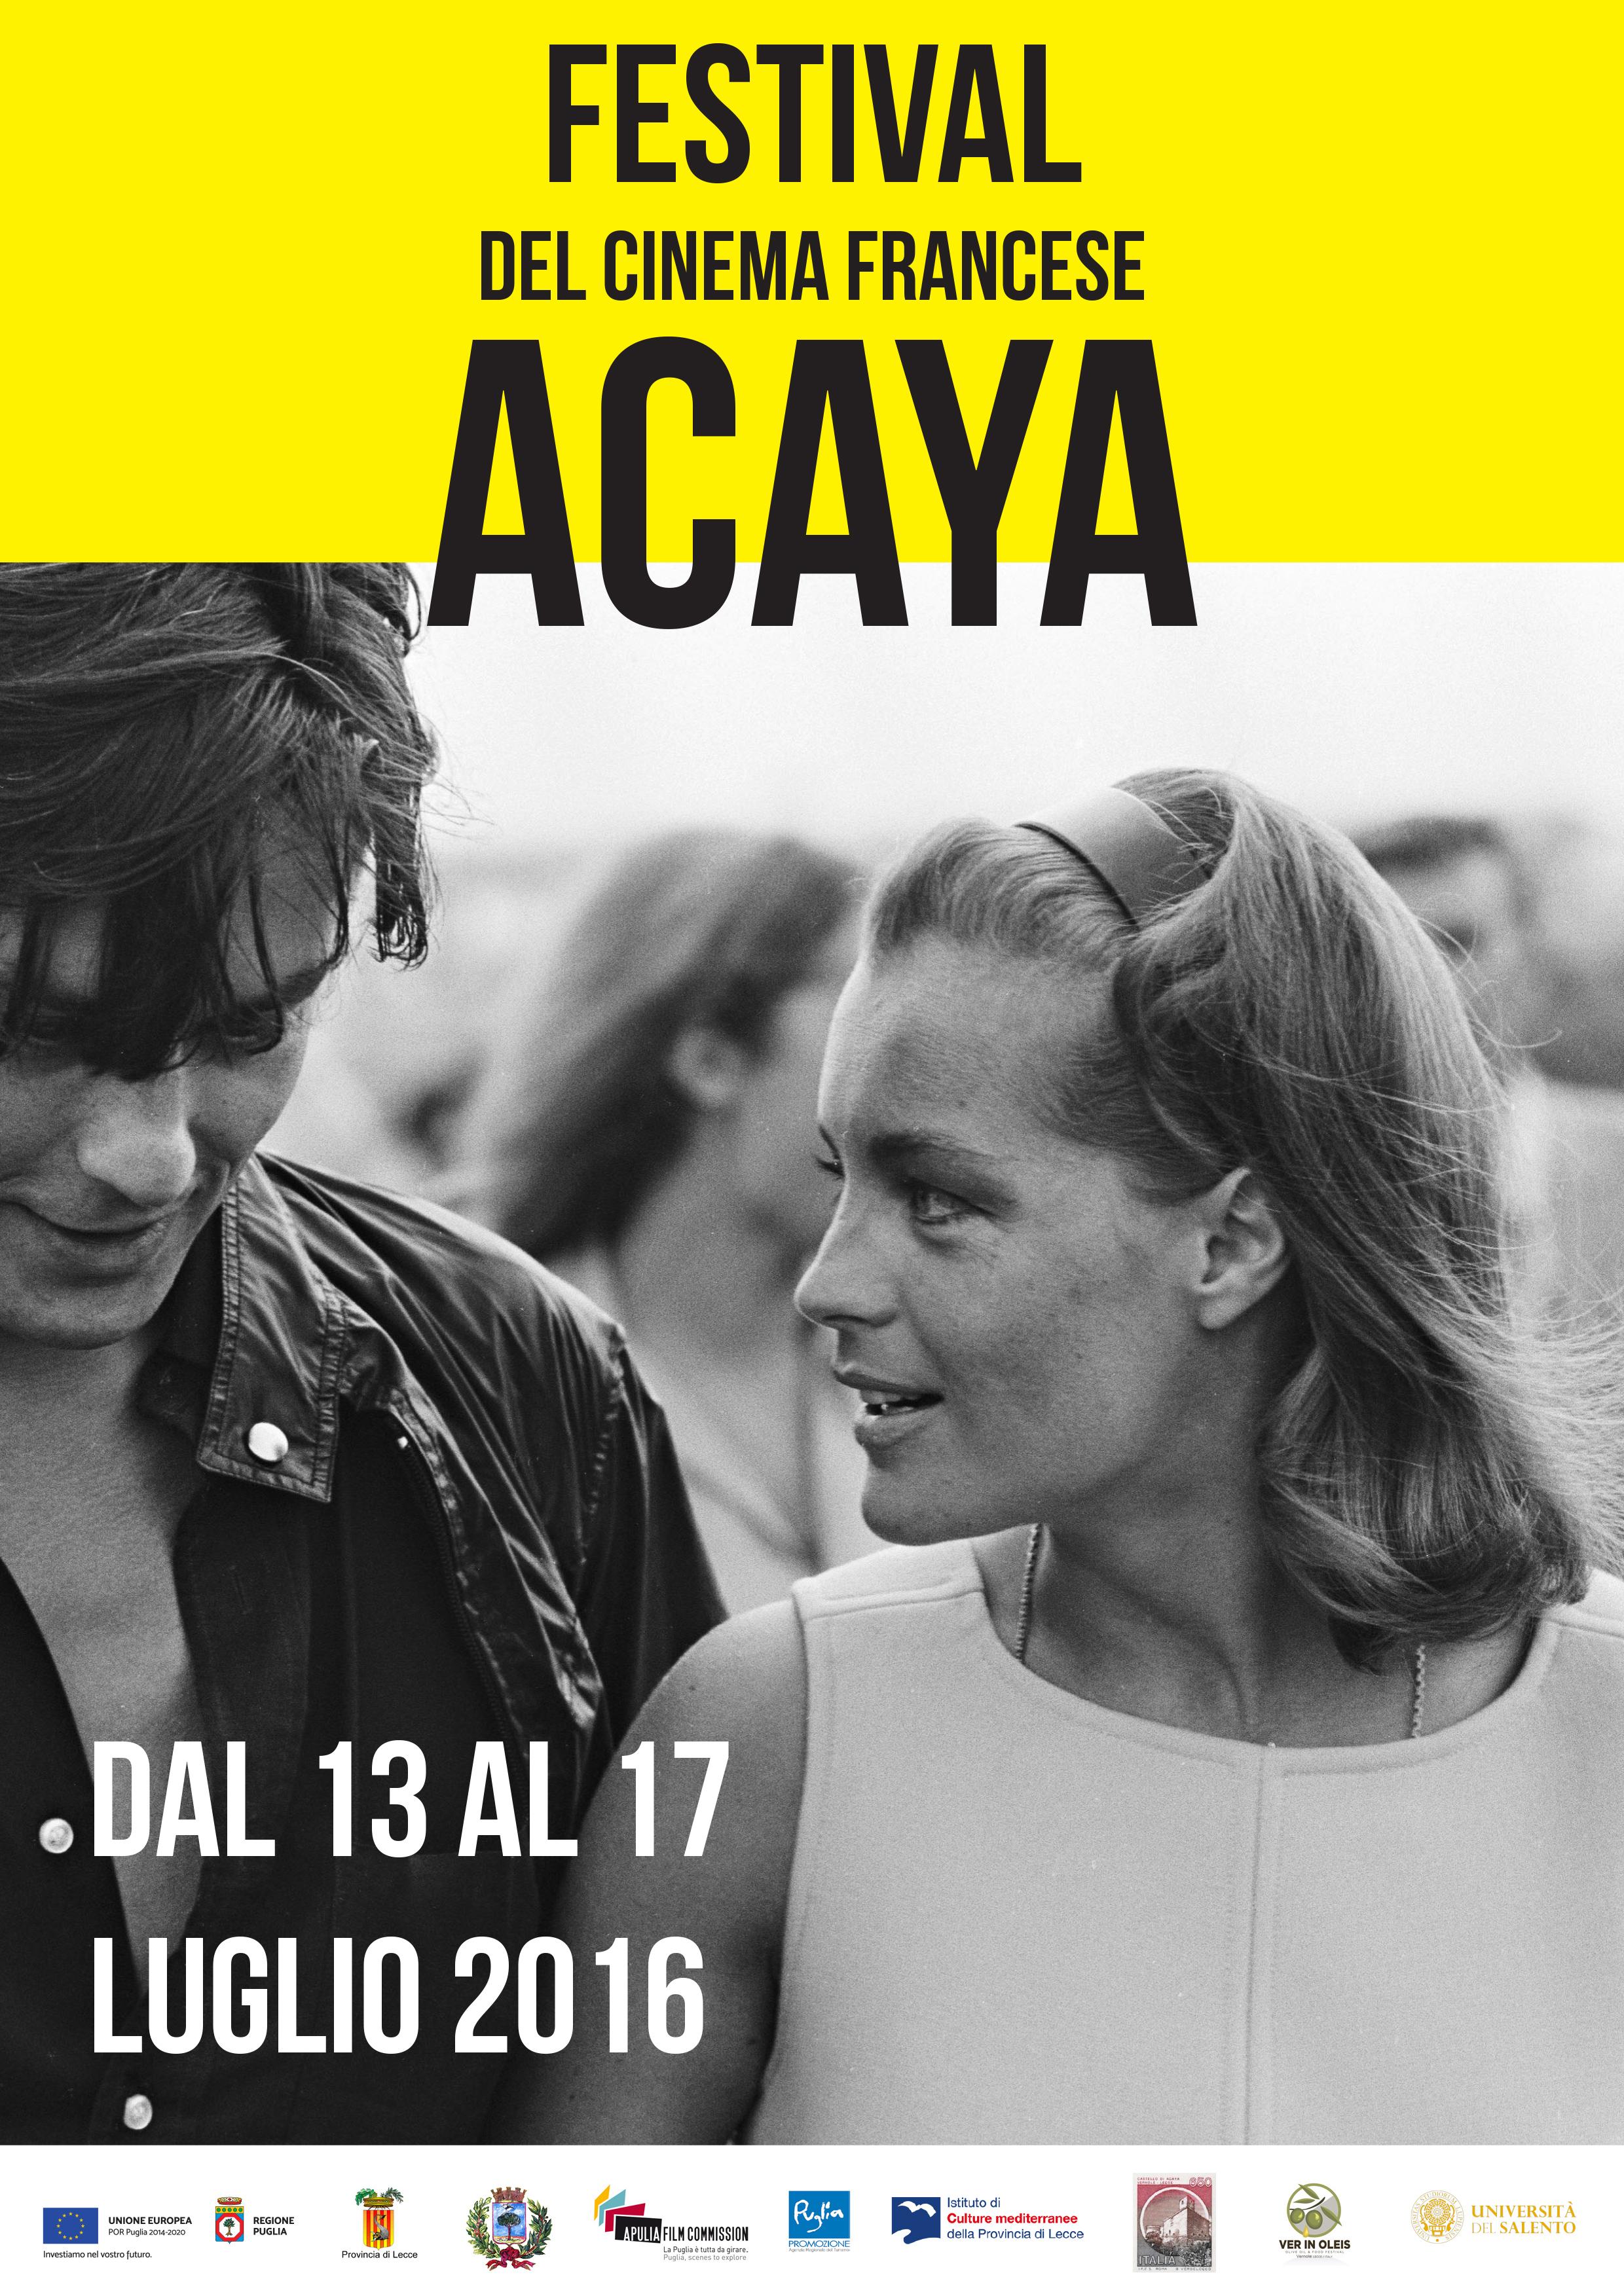 ACAYA-last-affiche-22-06-16-(1)